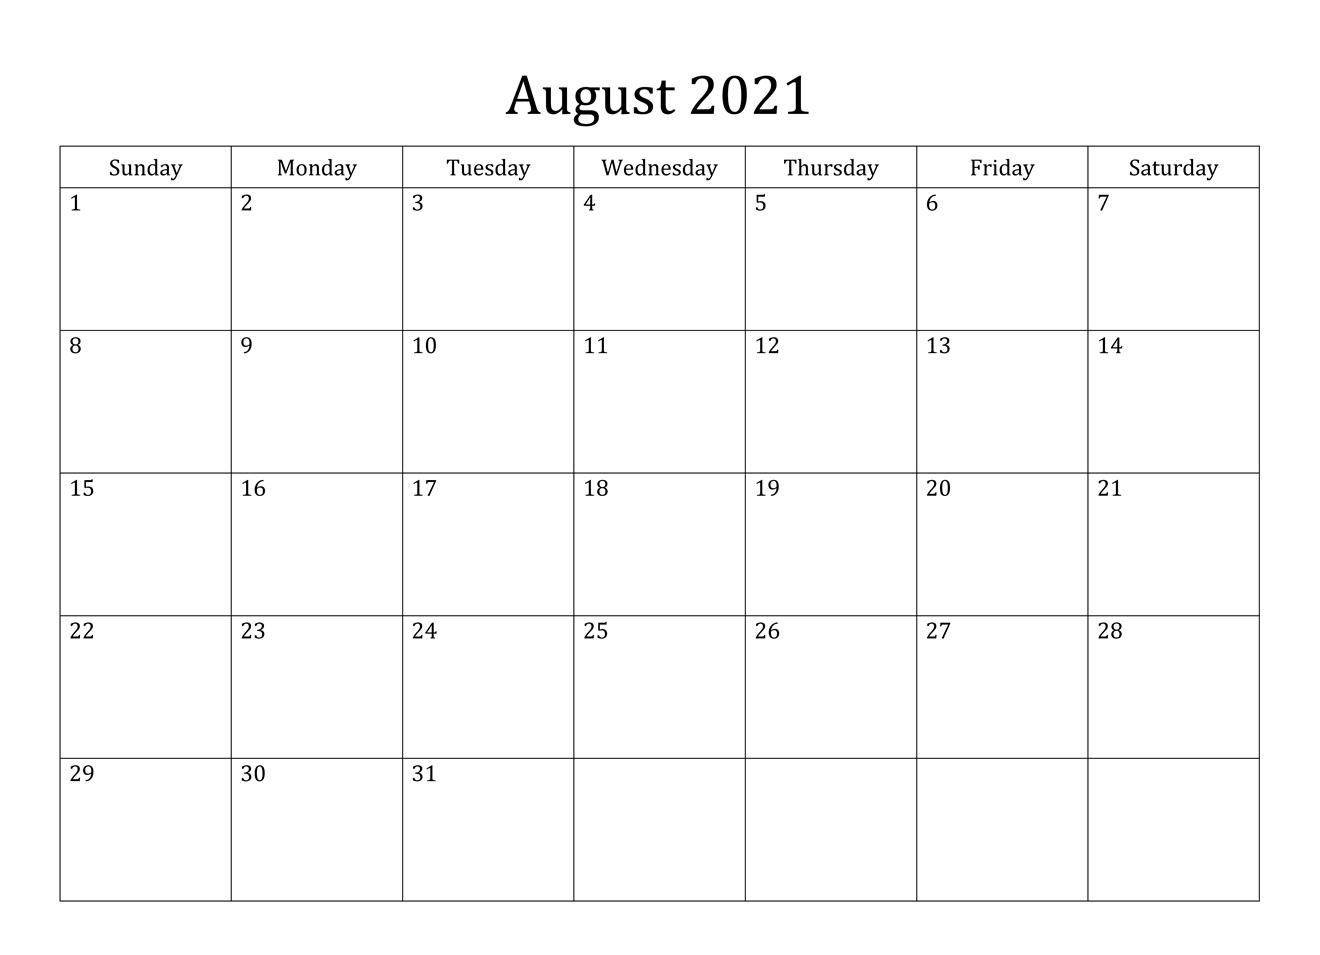 August 2021 Calendar PDF